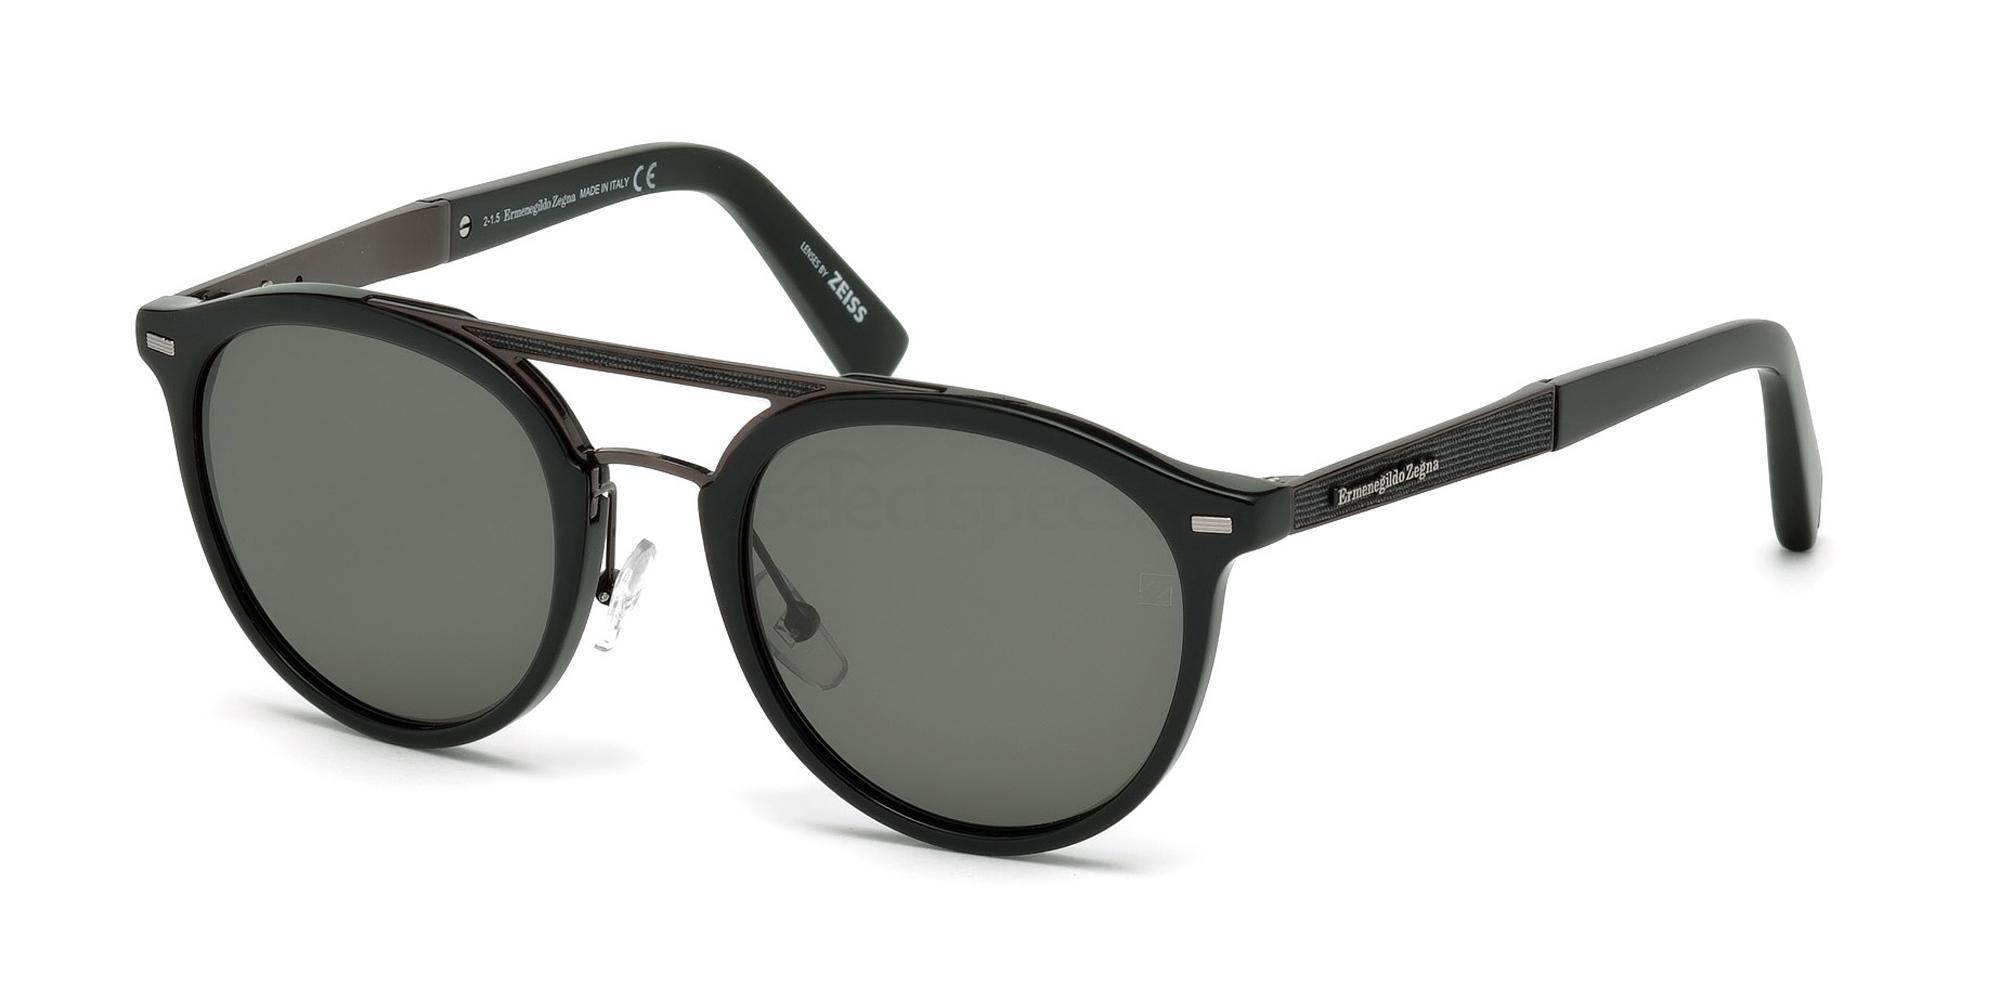 01D EZ0022 Sunglasses, Ermenegildo Zegna